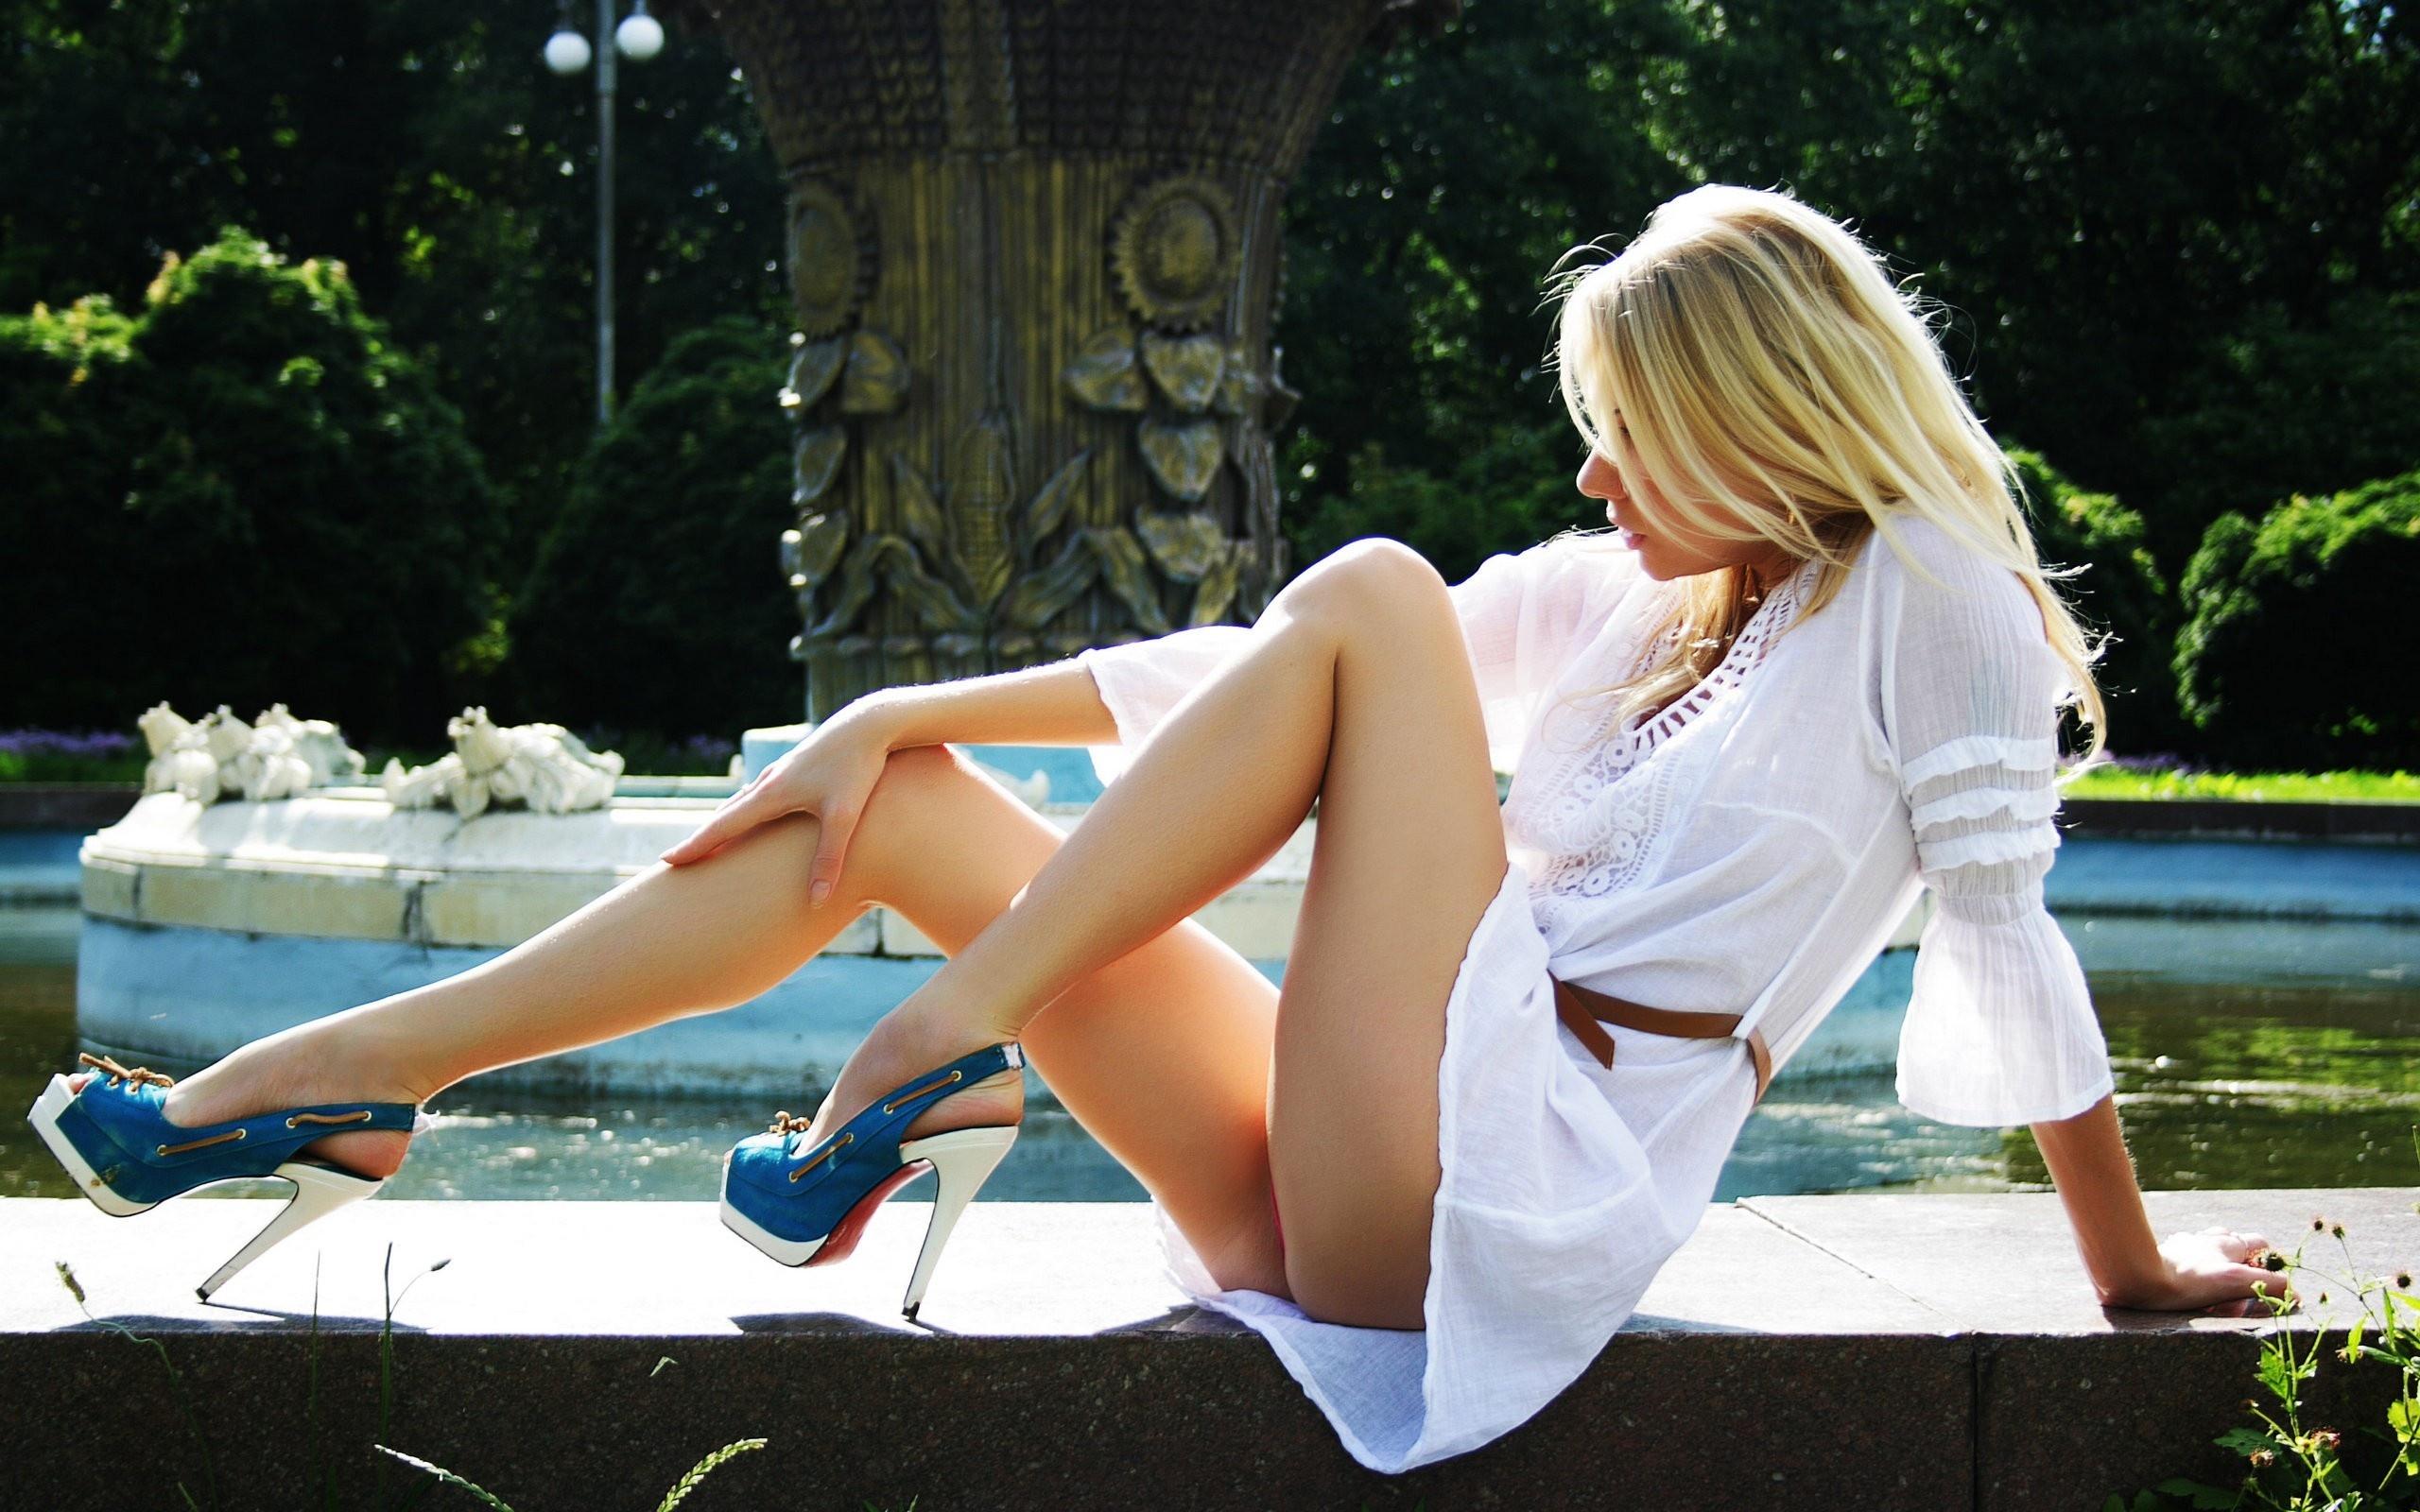 High heels babe nude galleries